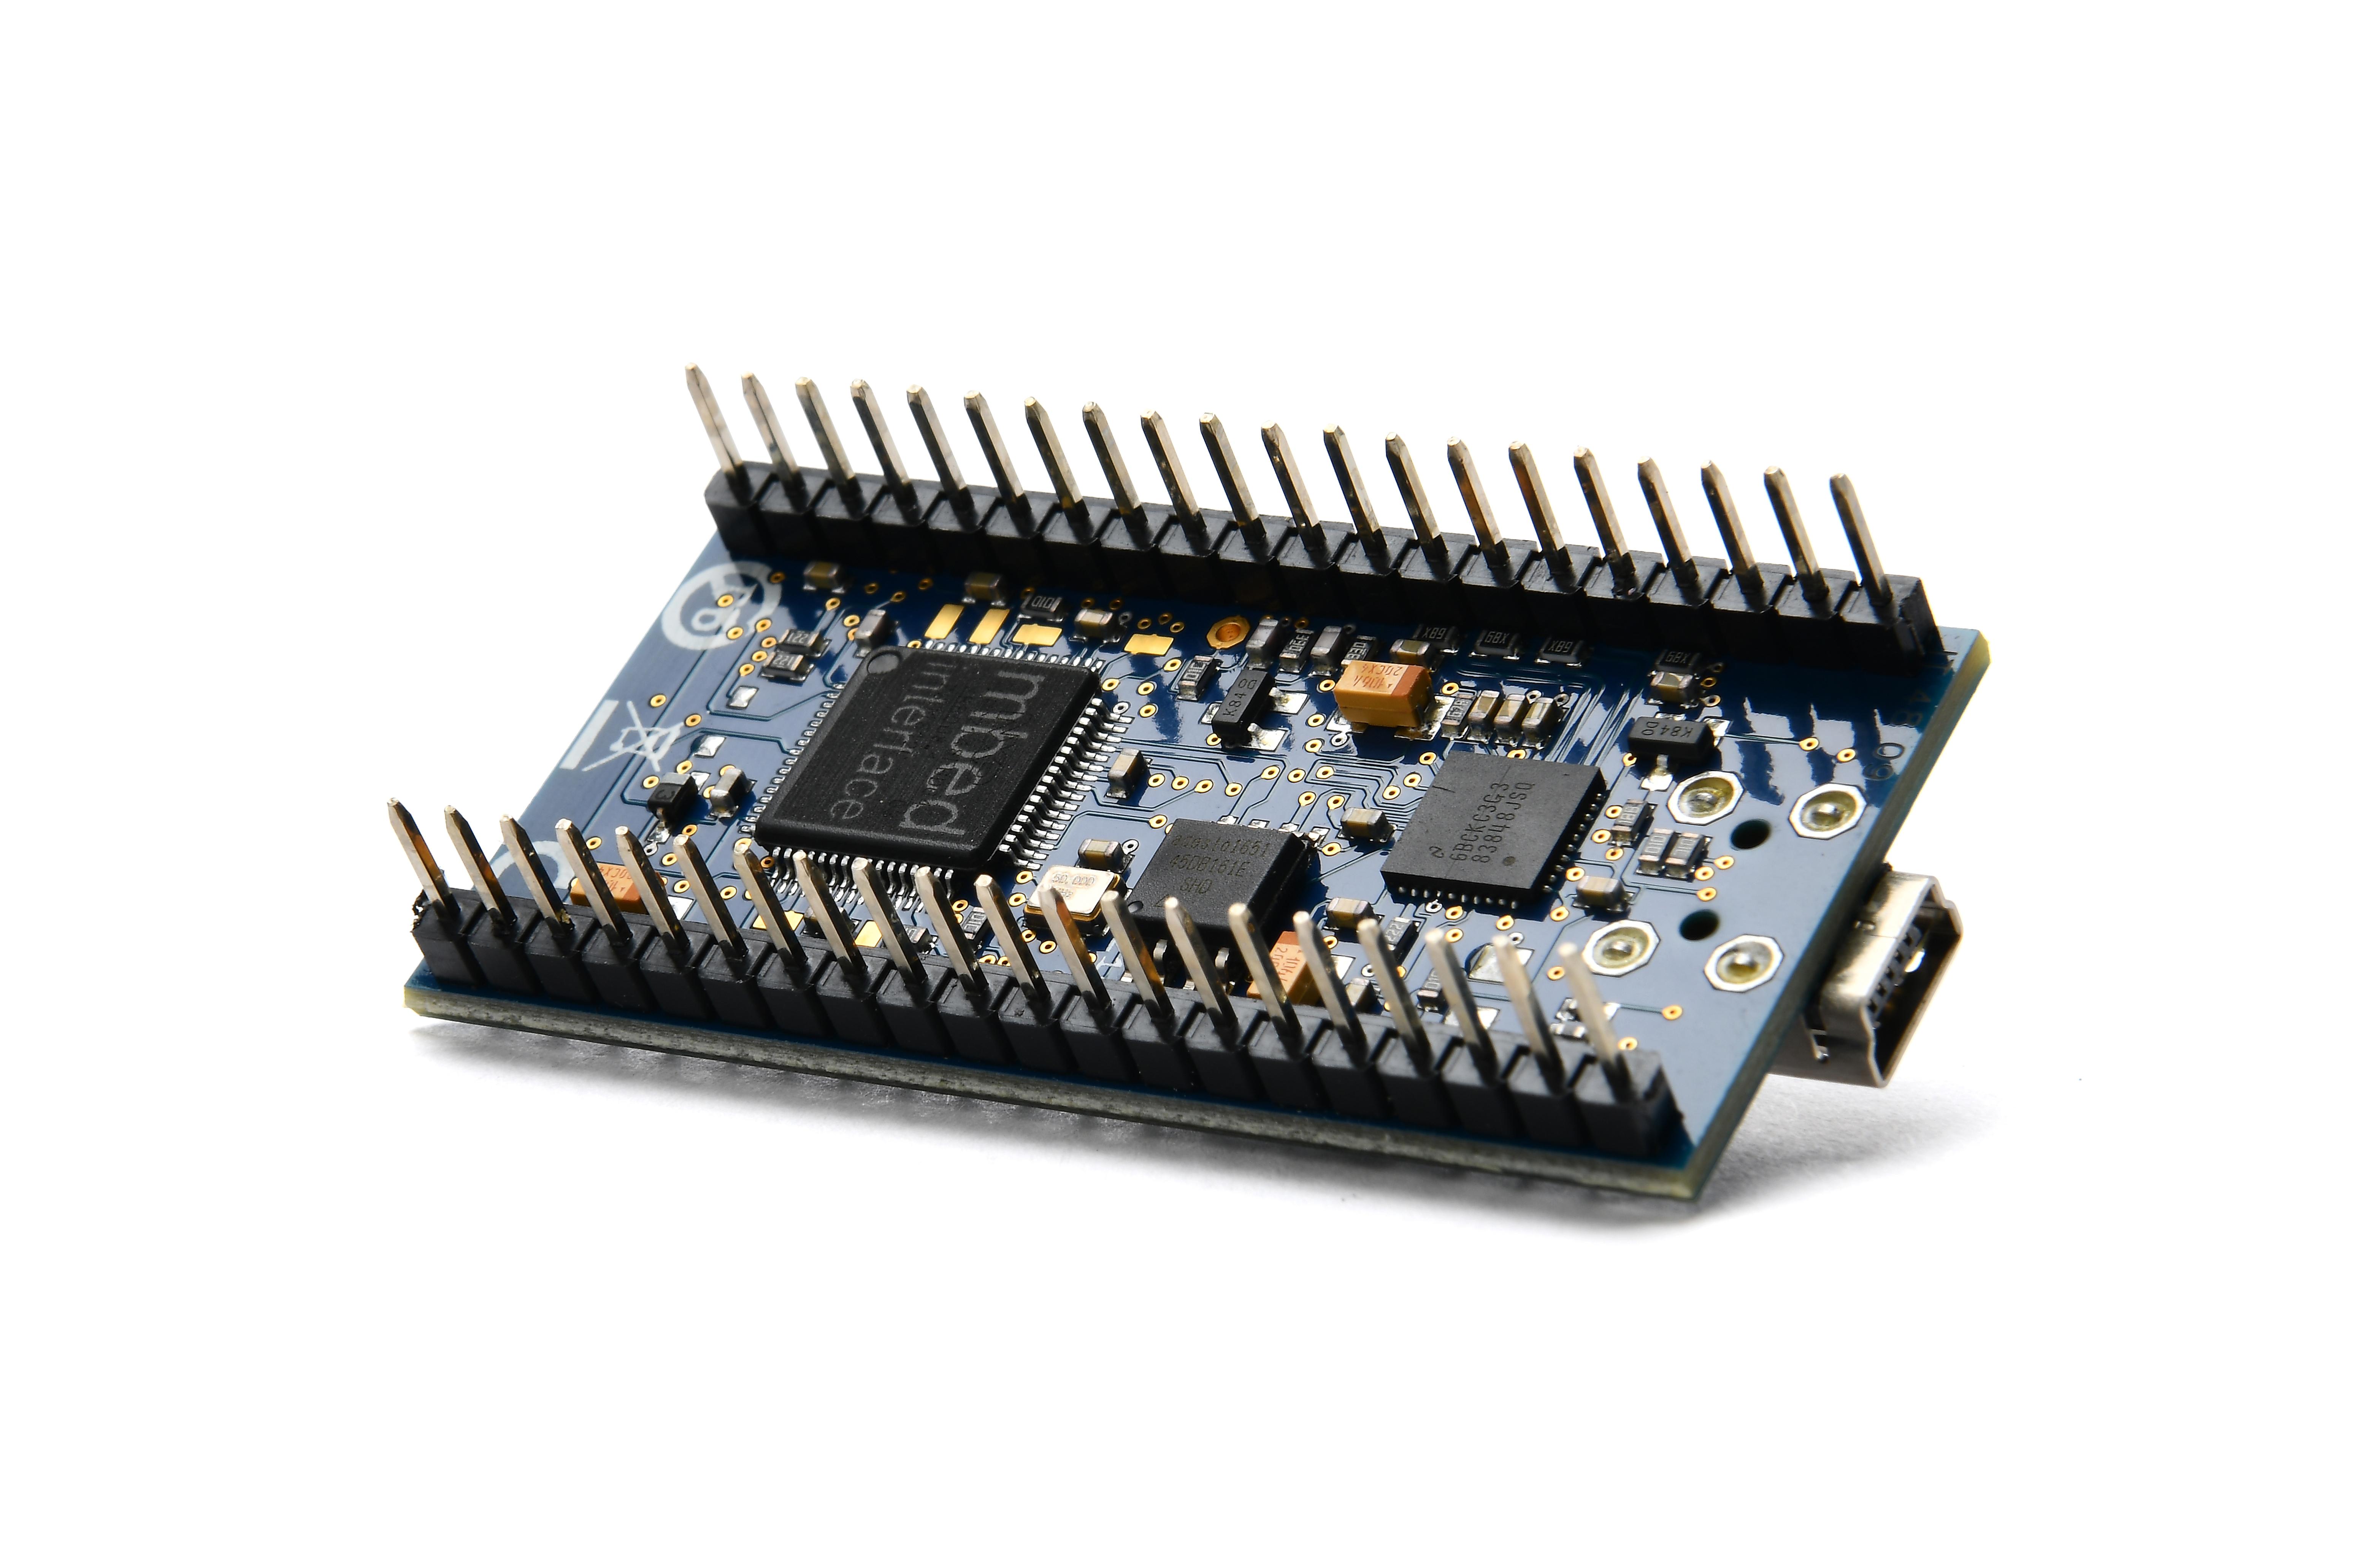 ARM mbed LPC1768-Modul